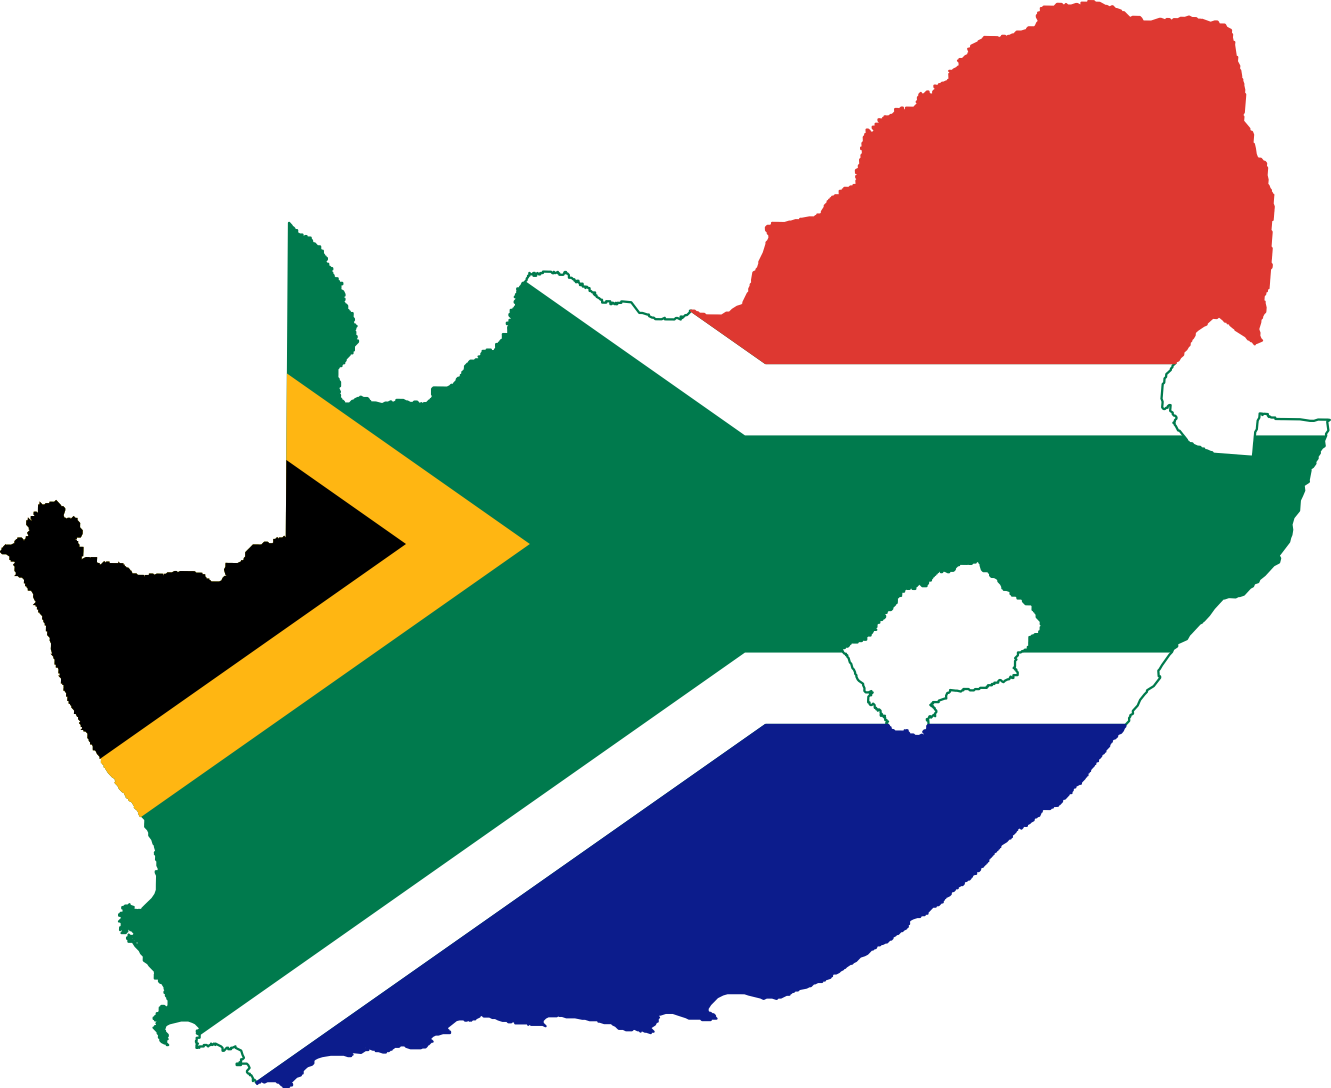 clip art south africa - photo #2